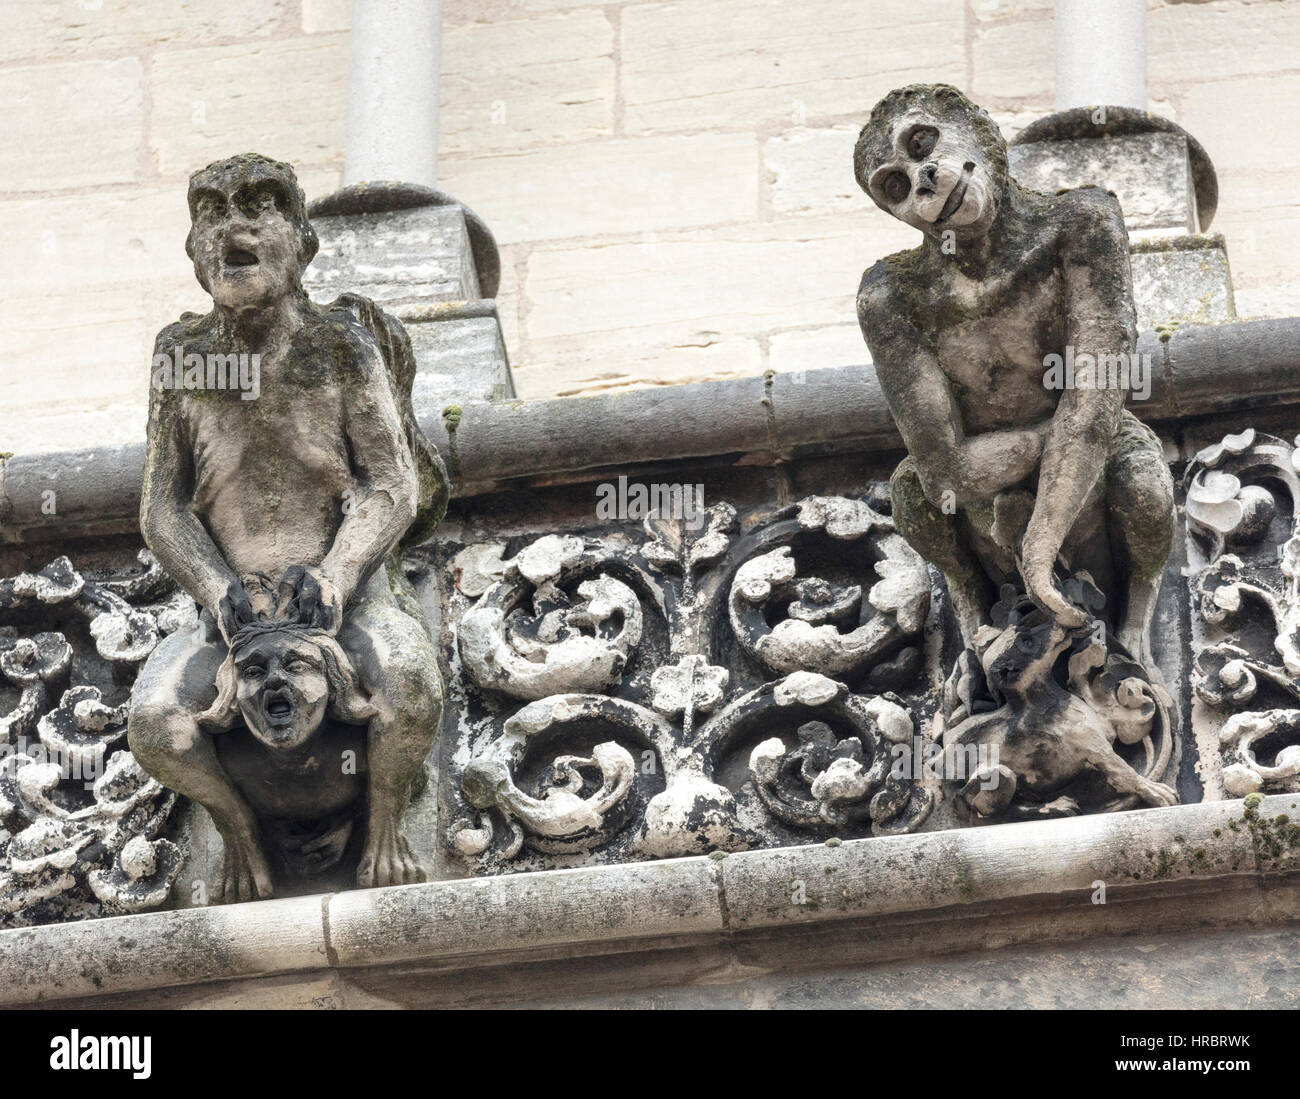 Fanciful gargoyles on the facade of Notre Dame Church, Dijon, Burgundy, France - Stock Image